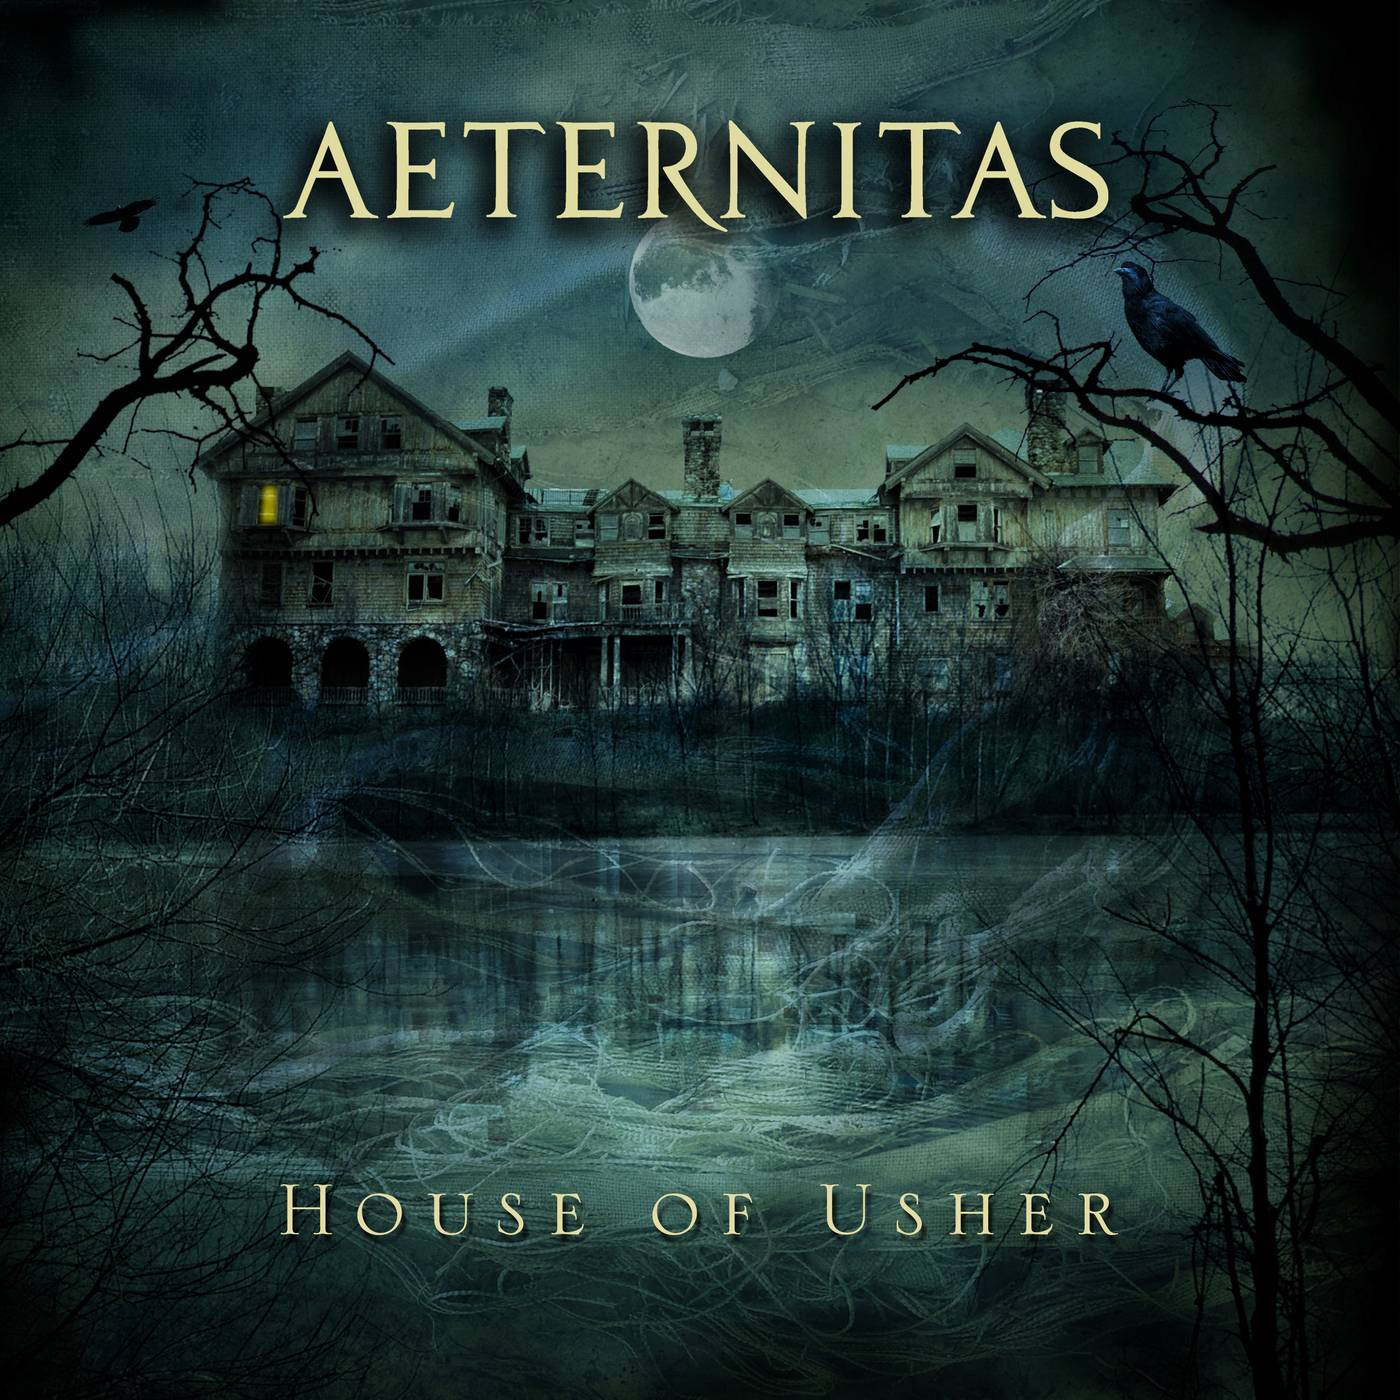 Aeternitas: House Of Usher (2016) Book Cover